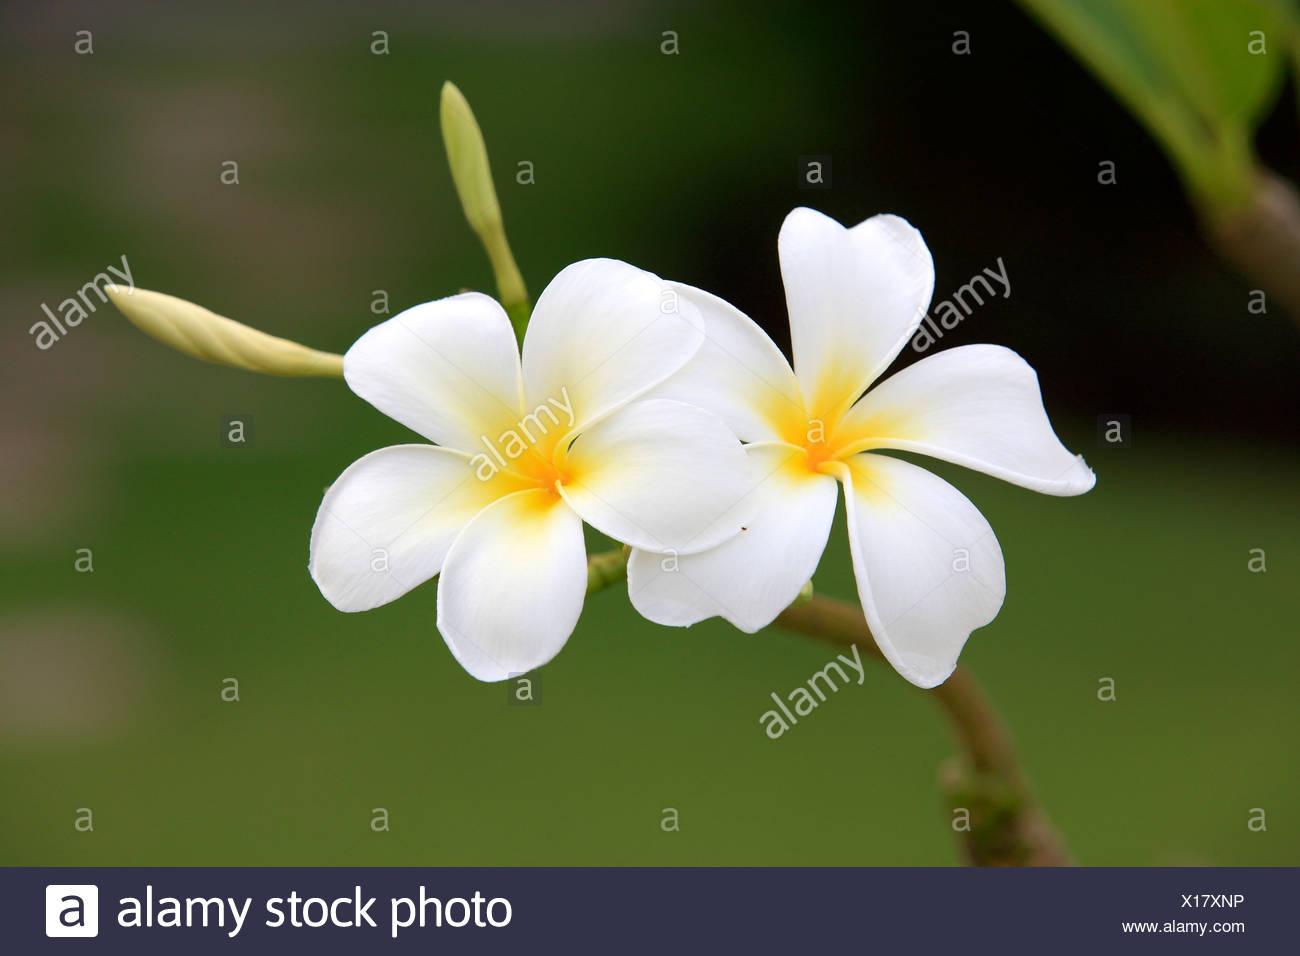 White frangipani (Plumeria pudica), flowers, Kota Kinabalu, Sabah, Malaysia, Borneo, Asia - Stock Image